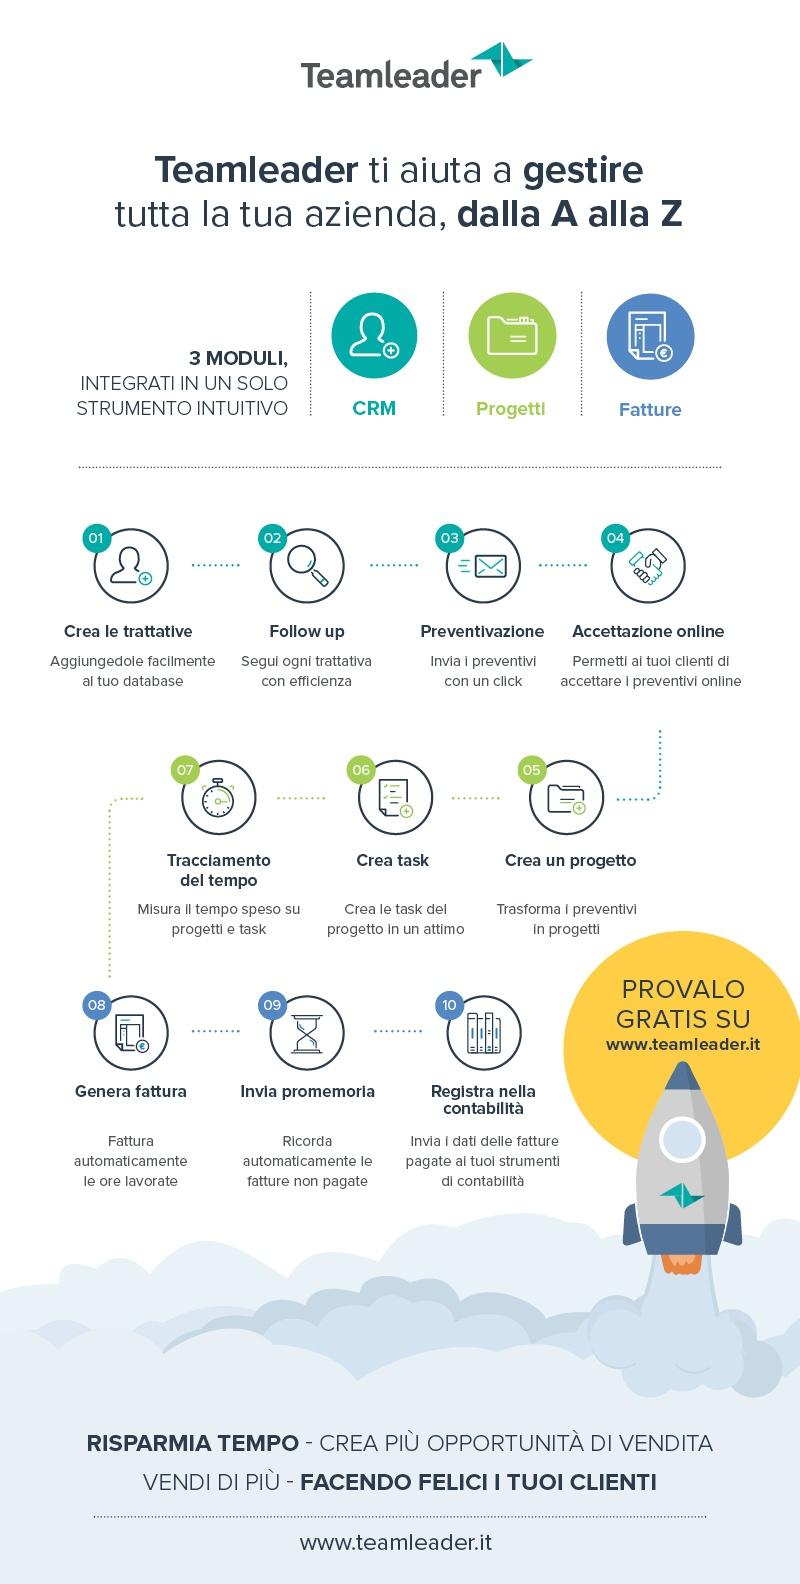 Infographic_ManageWorkflow_IT.jpg